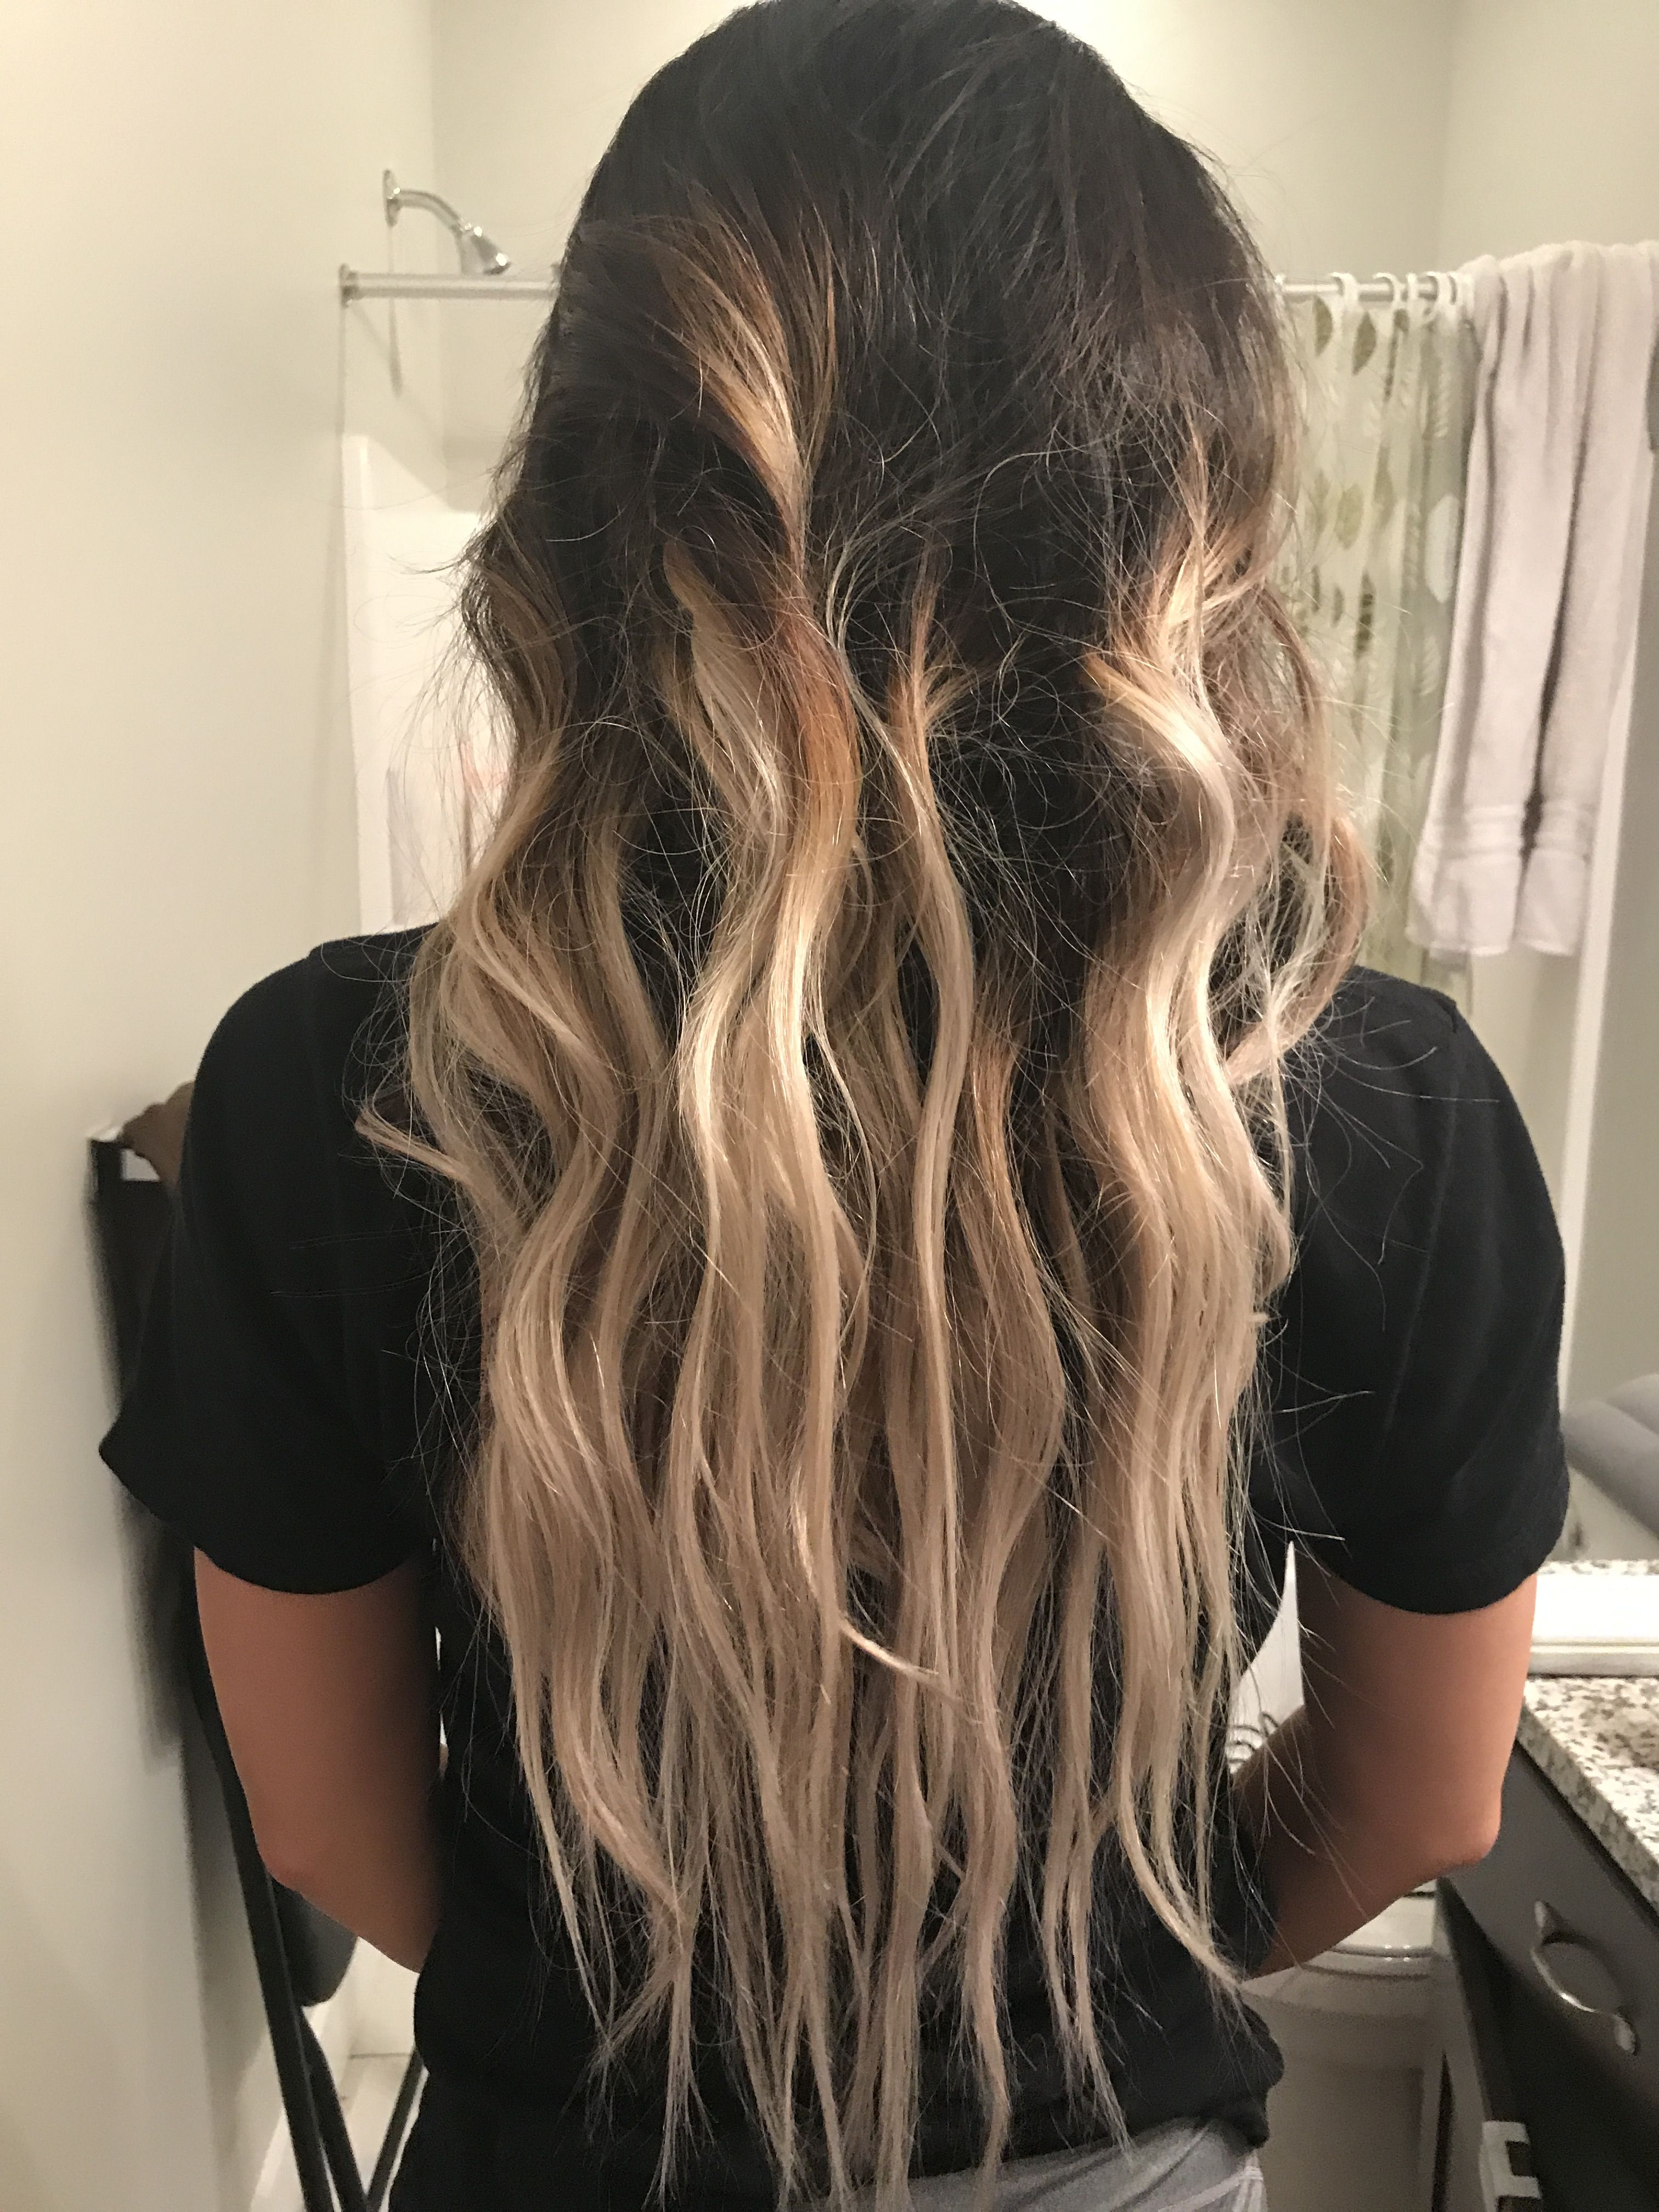 Pin By Jennifer Gee On Olaplex Purple Shampoo Black And Silver Hair Purple Shampoo Hair Styles